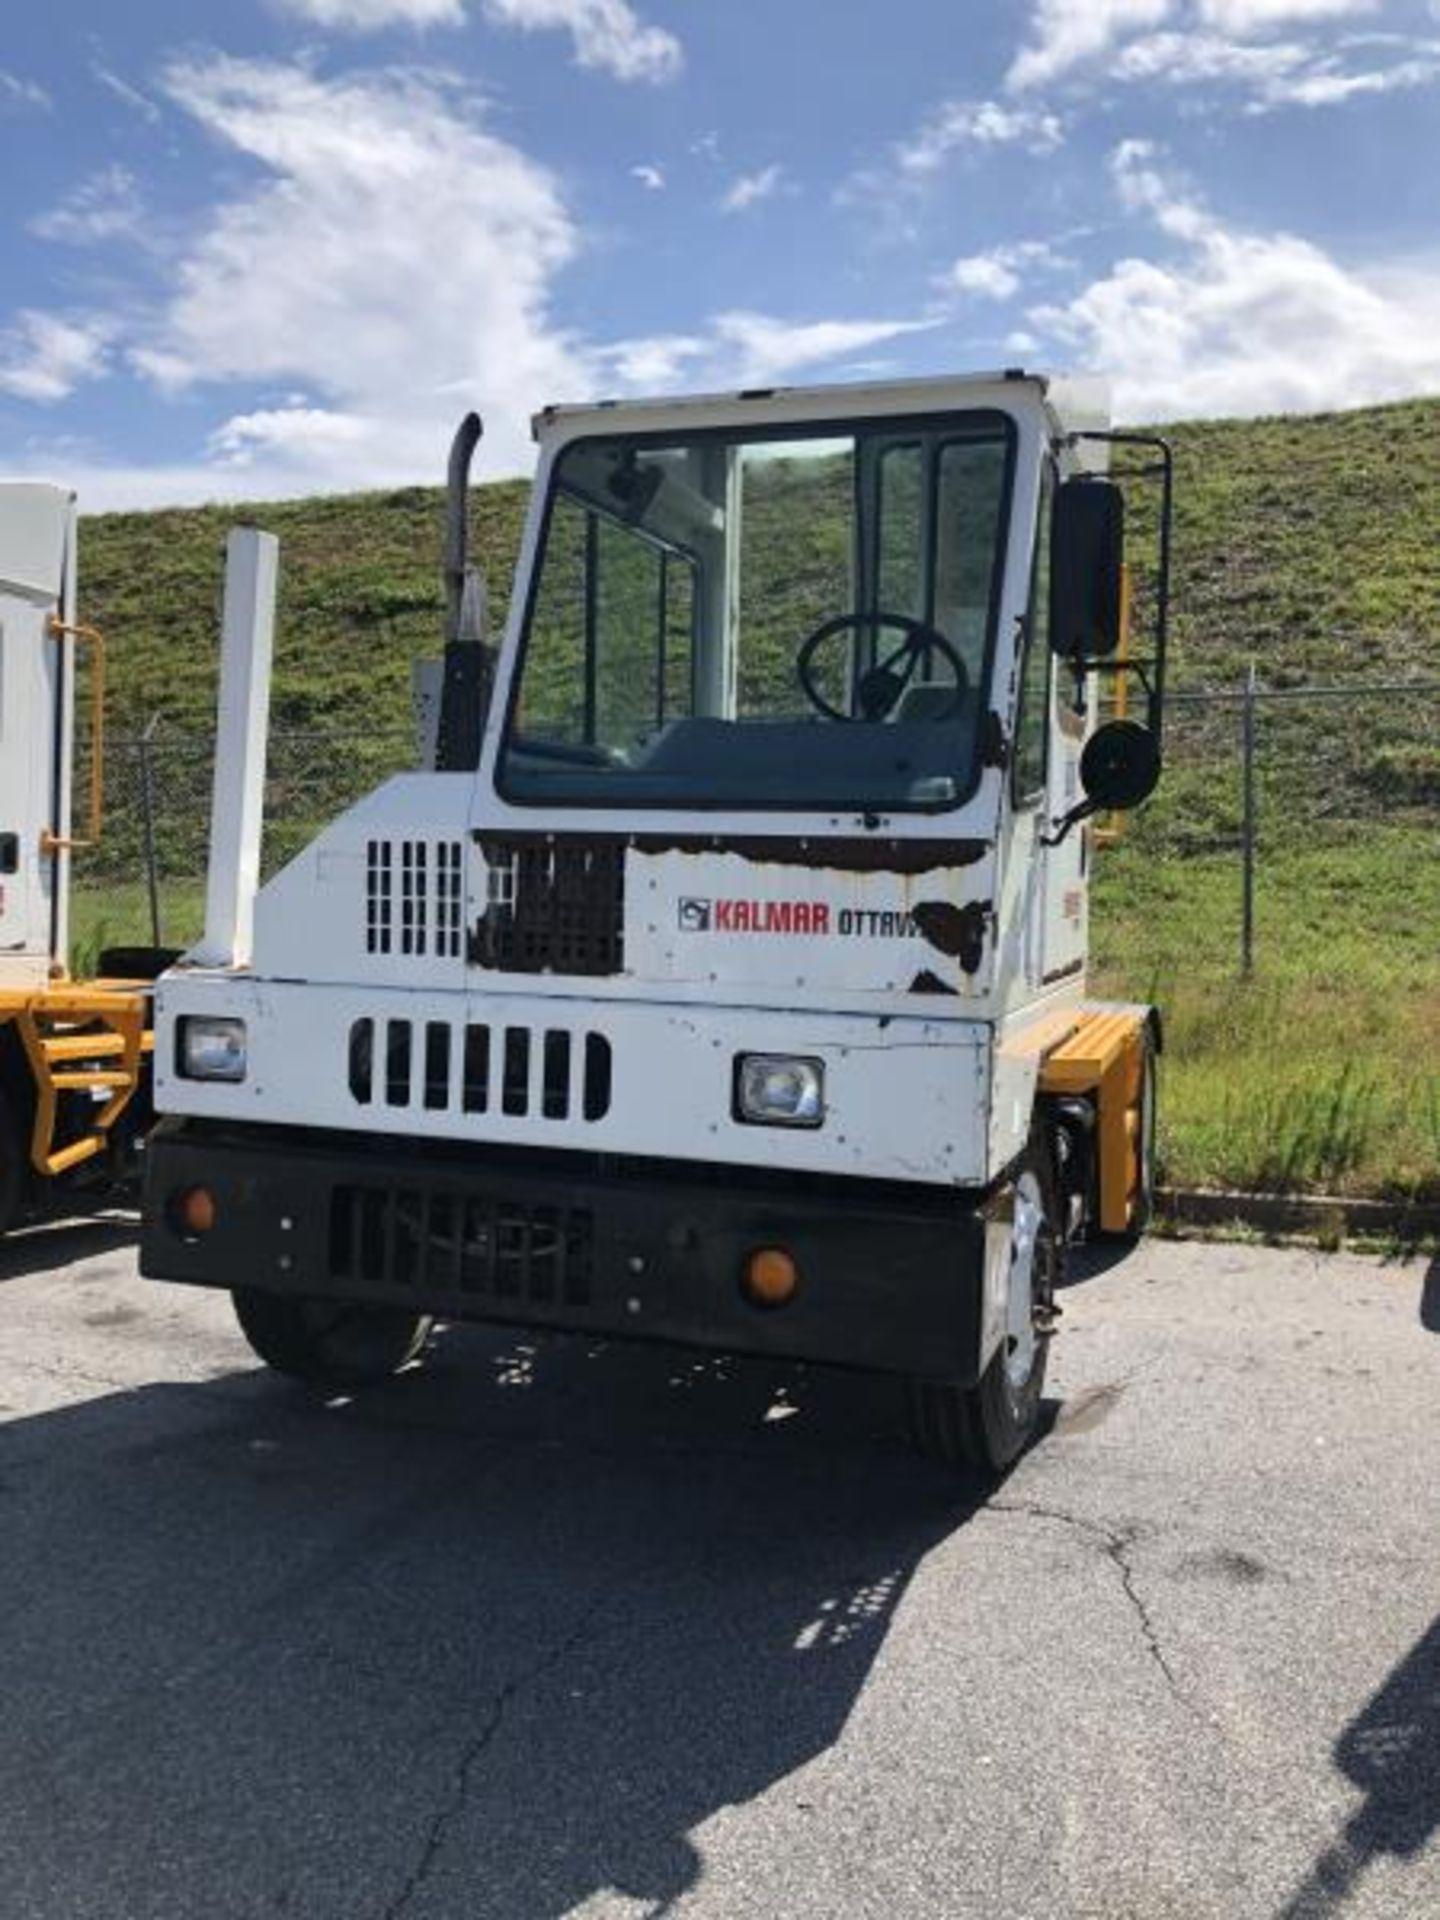 """2015 Kalmar Ottawa 4x2 Yard Truck , SN: 338840 4,378.6 Hours, 1,886 Miles - Image 36 of 36"